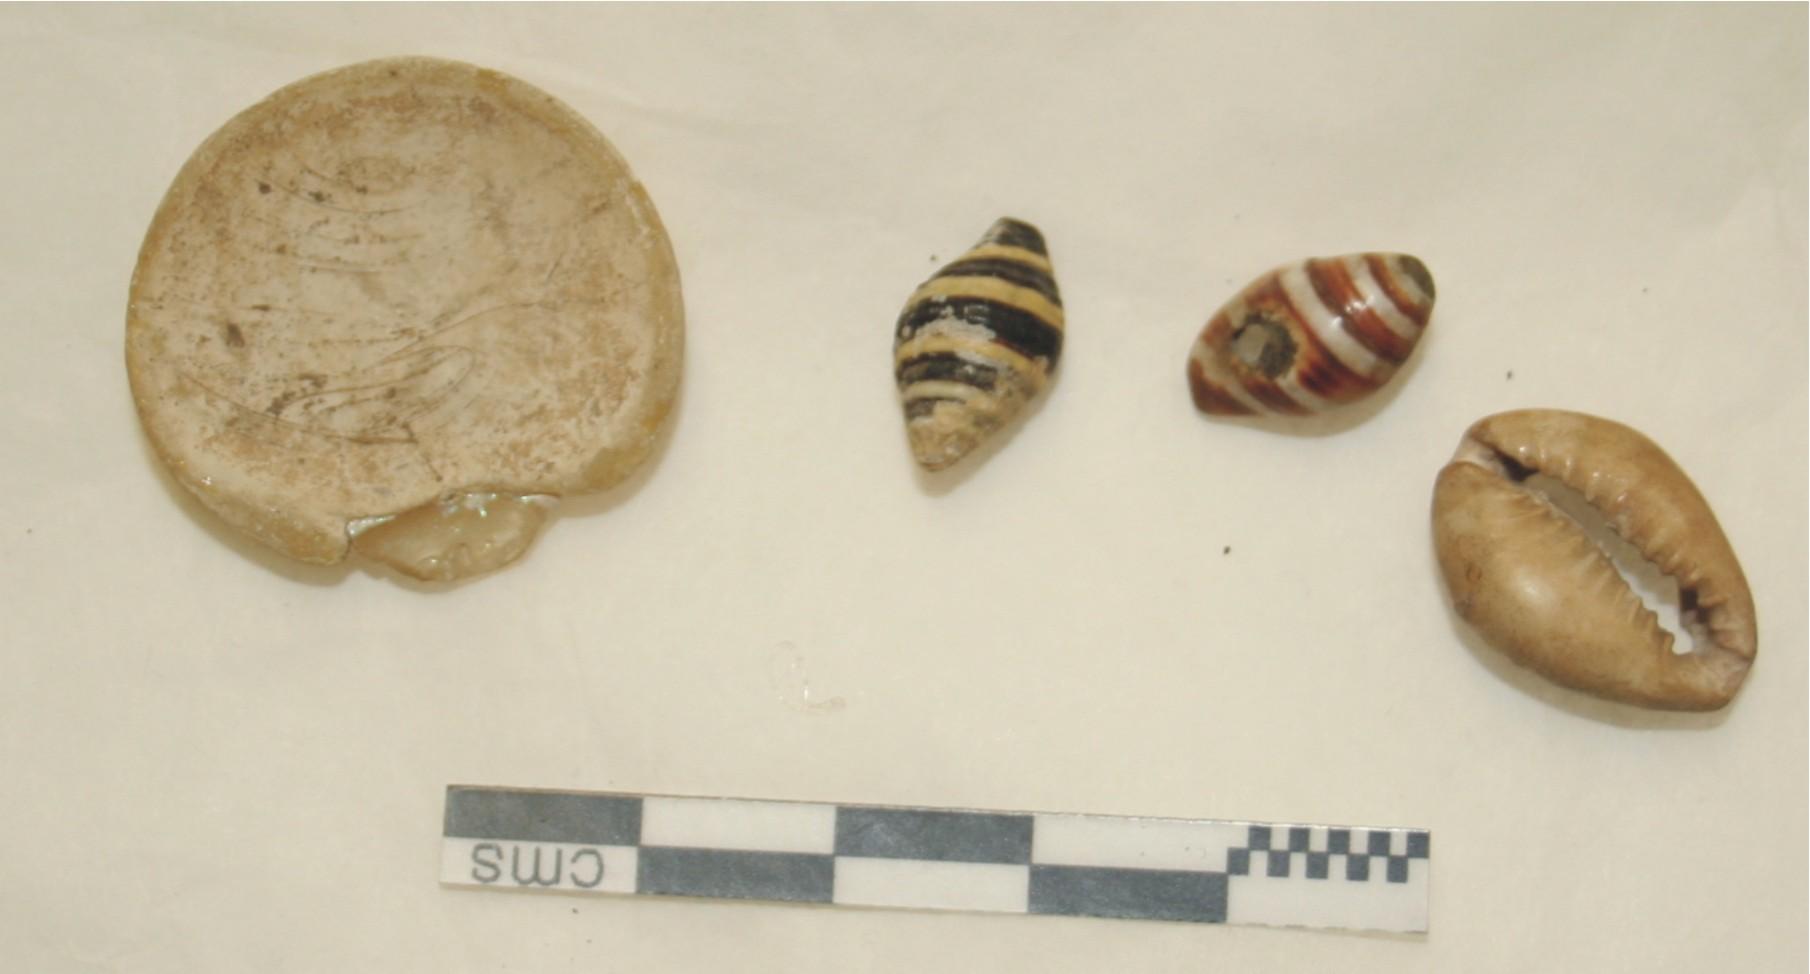 Image for: Shells